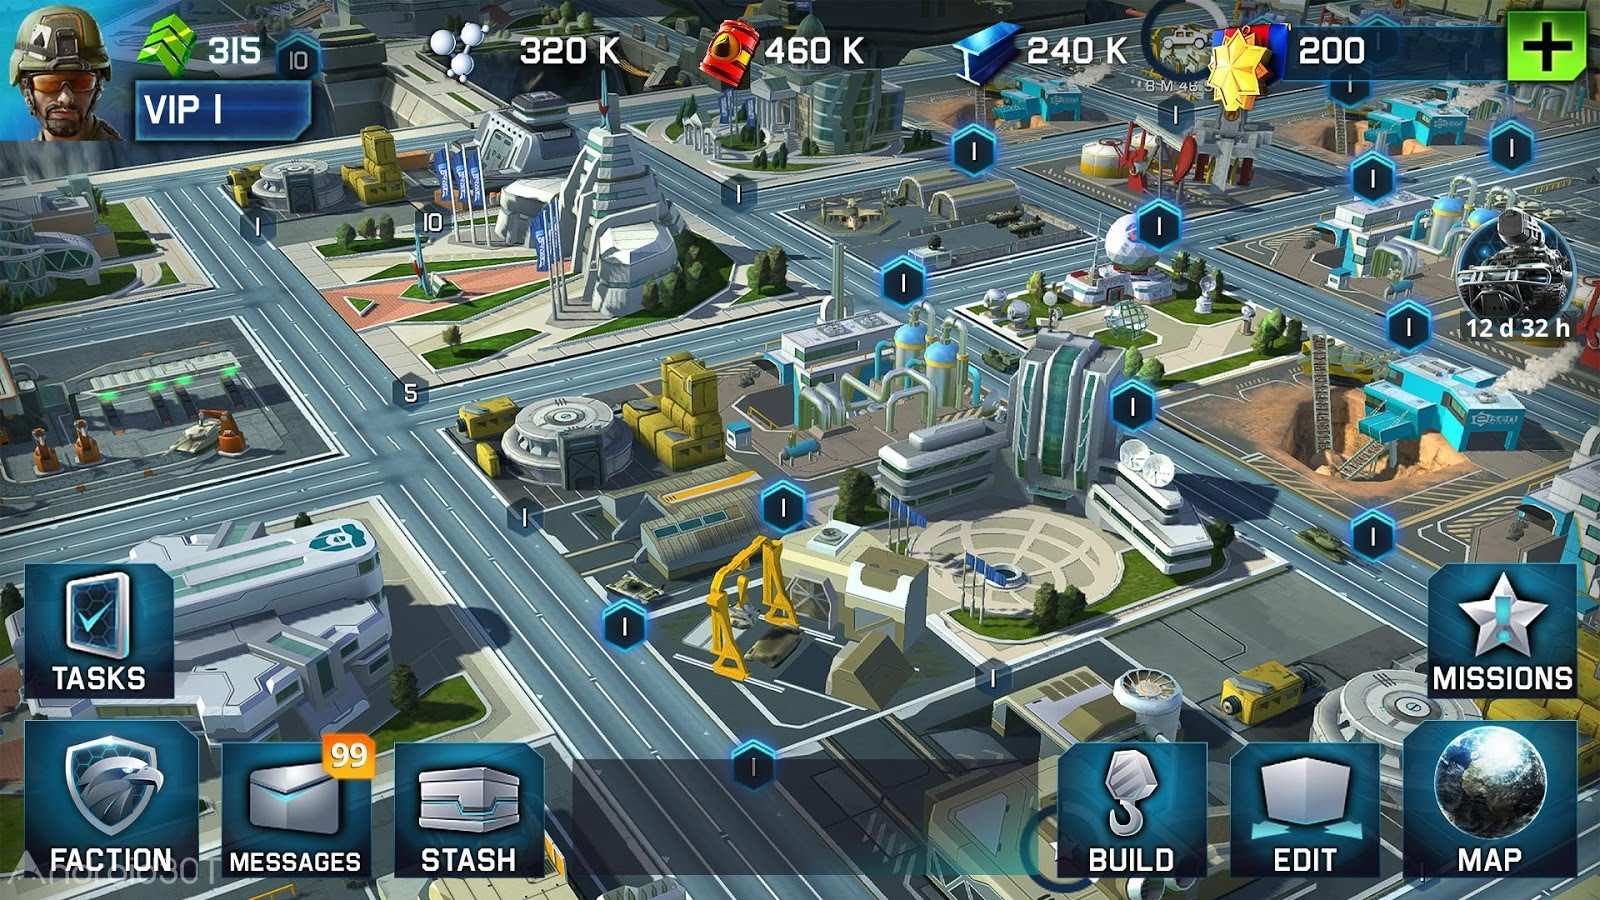 دانلود War Planet Online: Global Conquest 3.7.3 – بازی جنگ سیاره اندروید